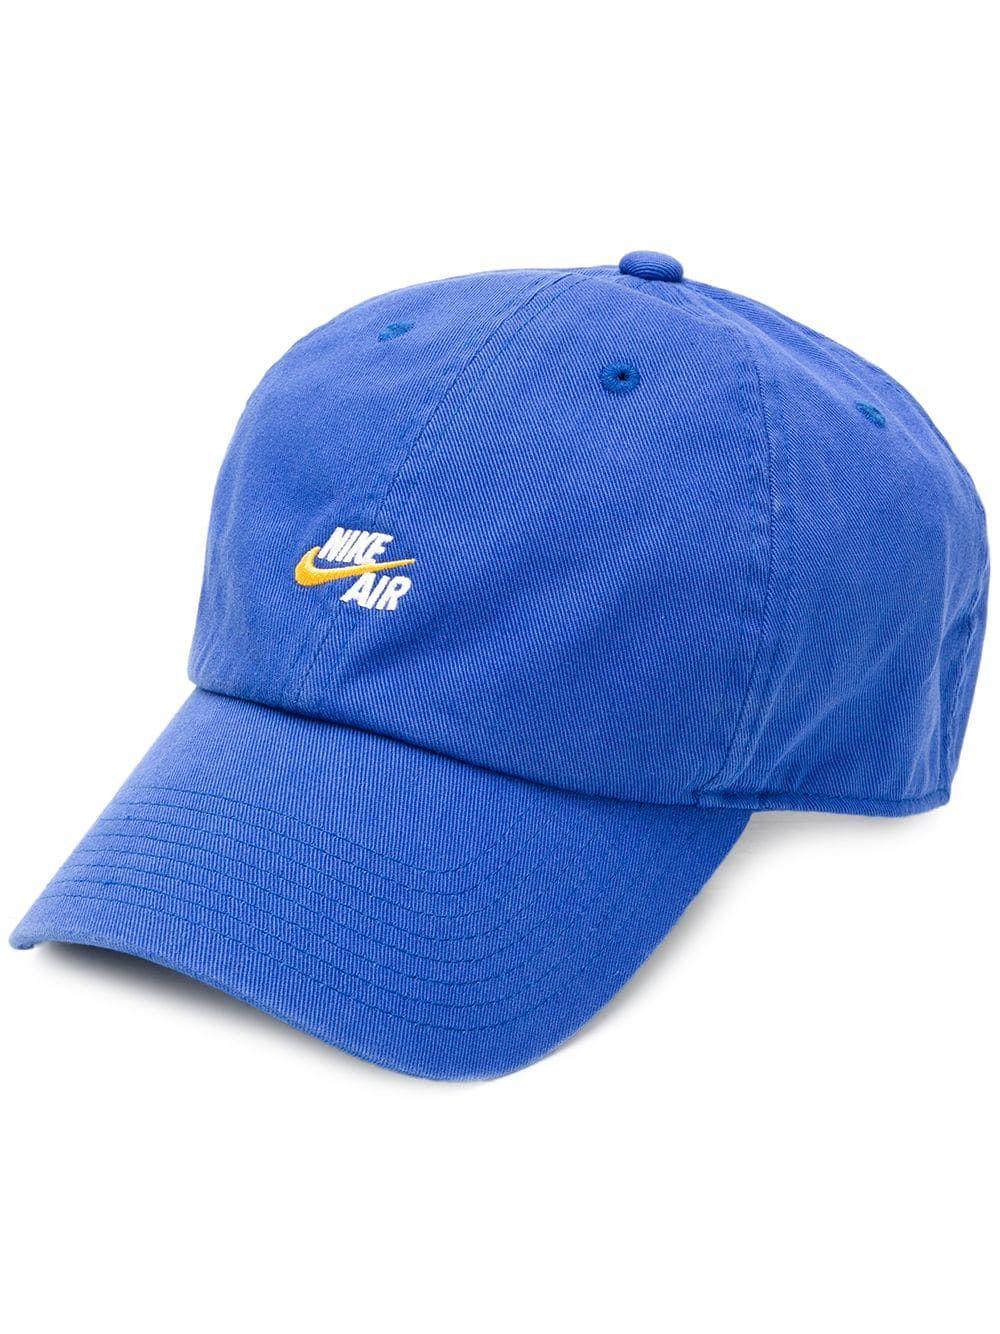 NIKE NIKE AIR HERITAGE 86 CAP - BLUE.  nike  fb00ed98110